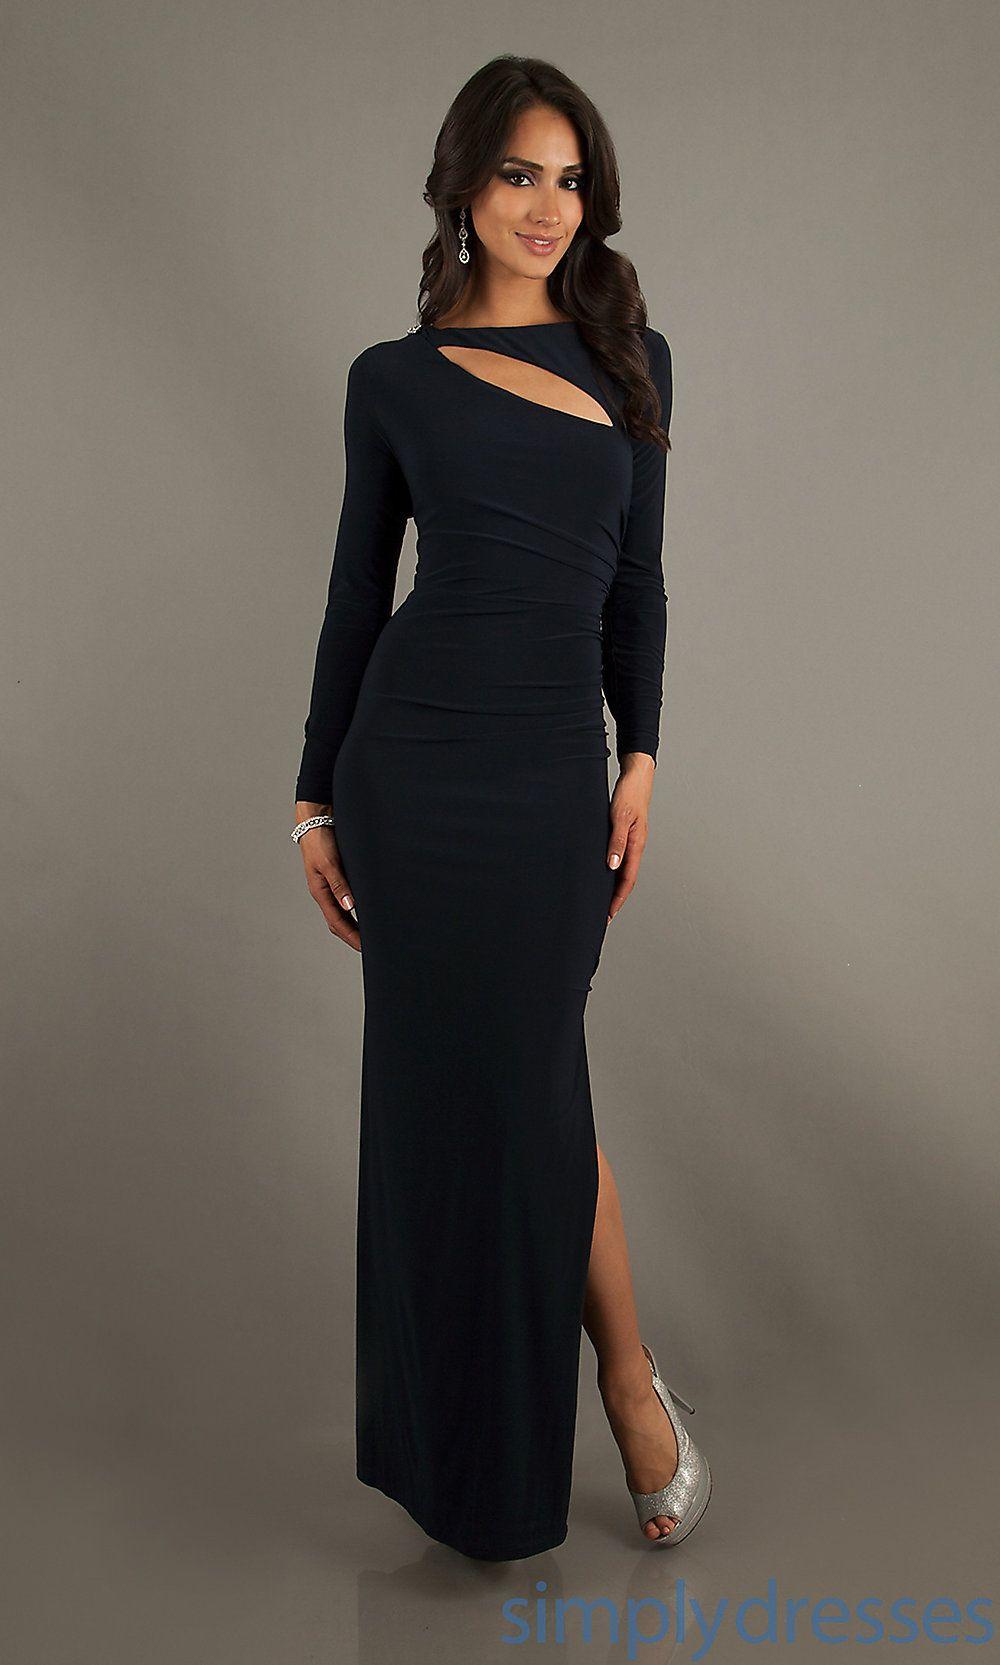 Long Sleeve Form Fitting Formal Dress Long Fitted Dresses Long Sleeve Dress Formal Long Sleeve Fitted Dress [ 1665 x 1000 Pixel ]